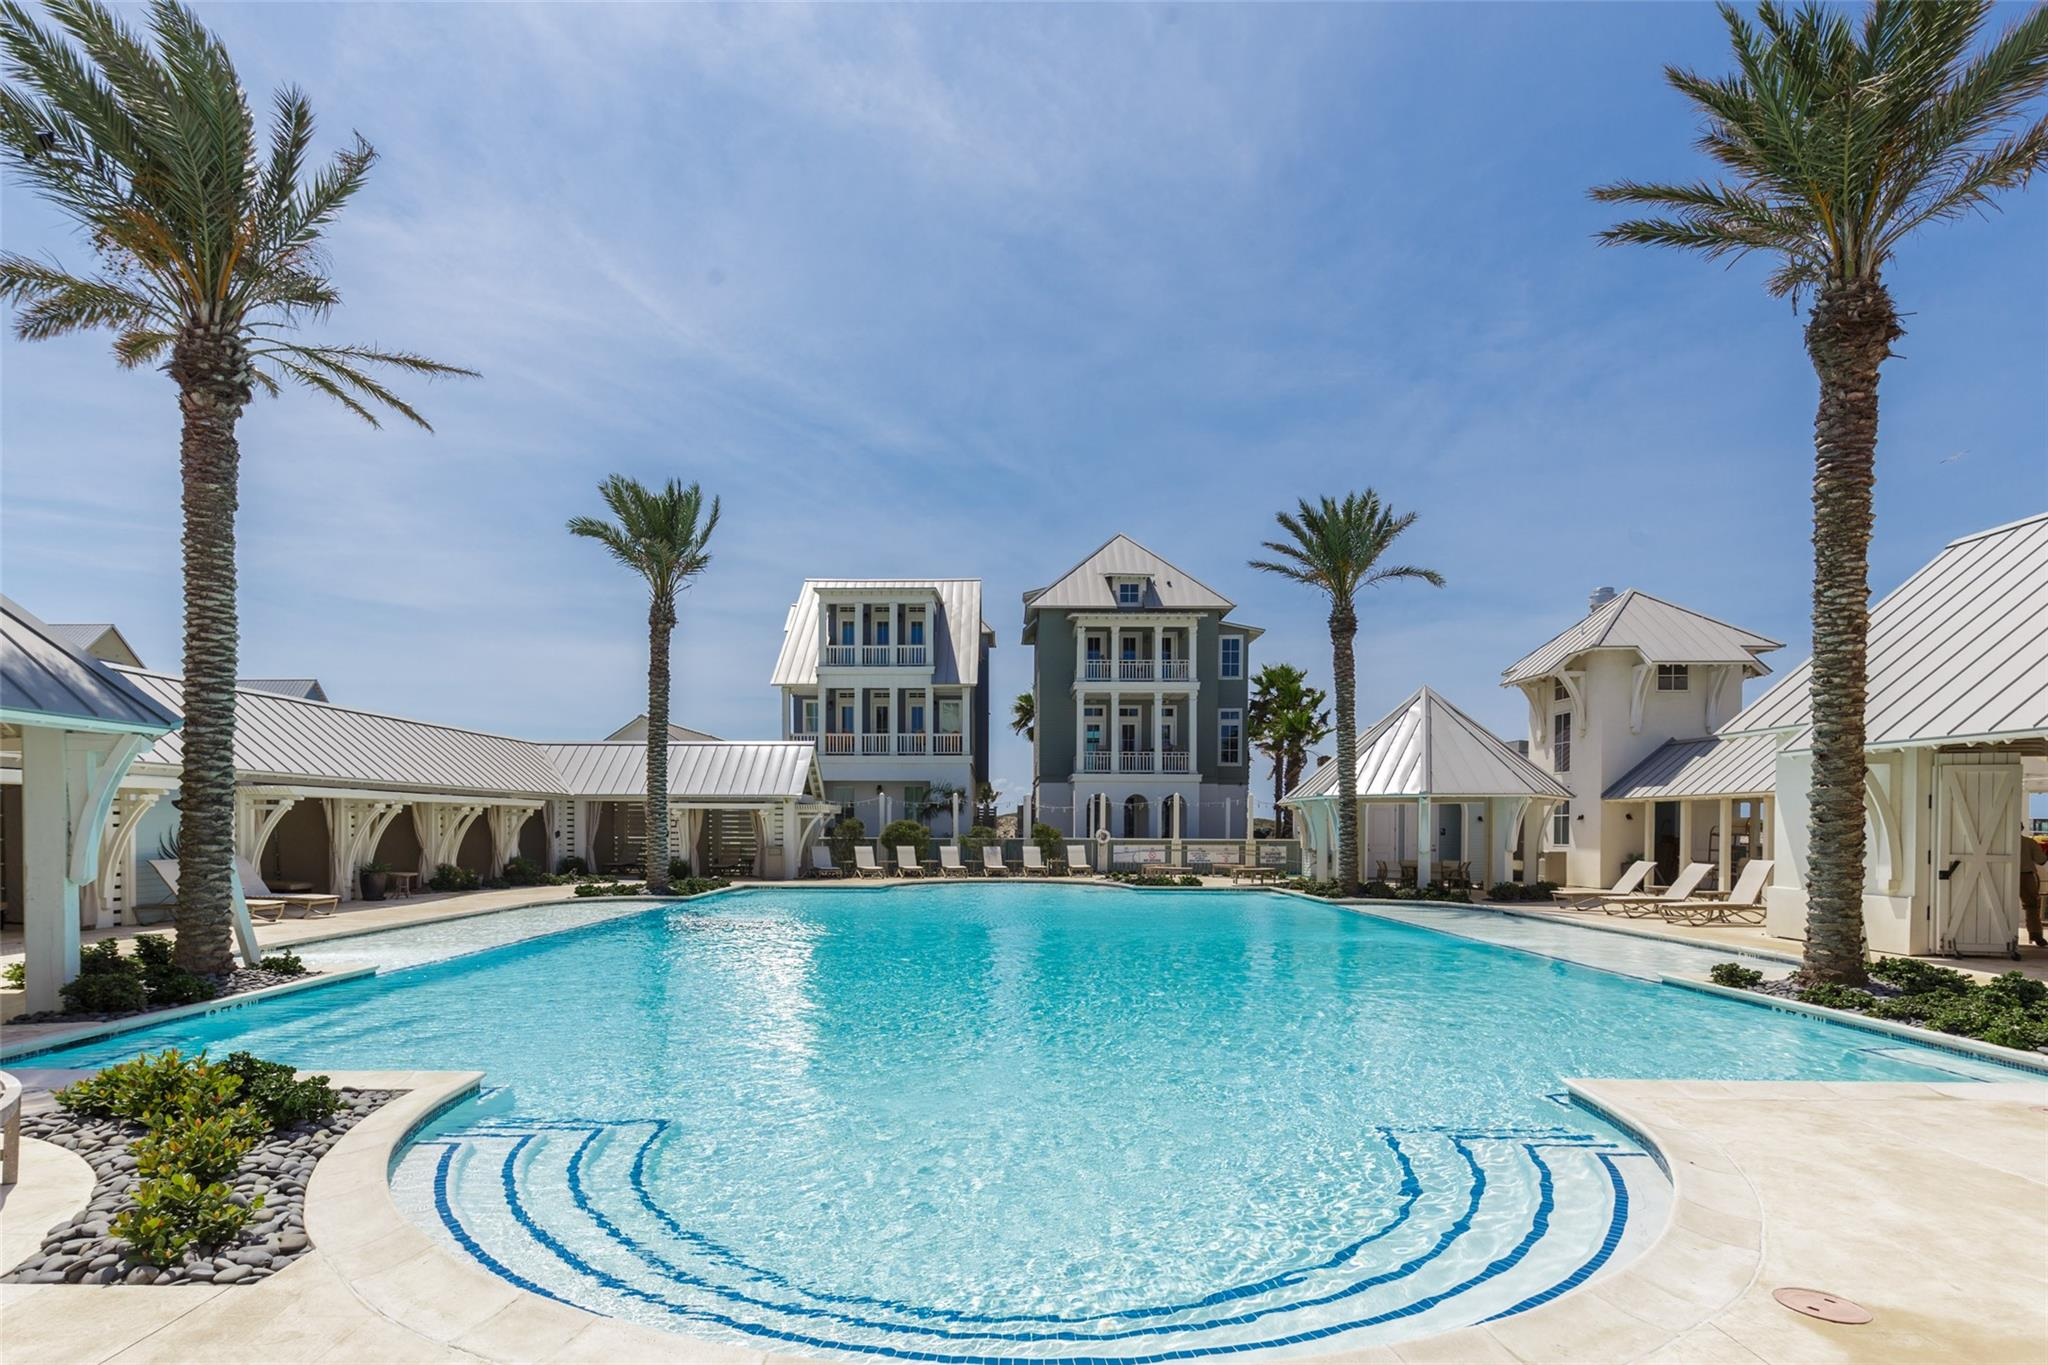 137 Palmilla Circle #302 Property Photo - Port Aransas, TX real estate listing